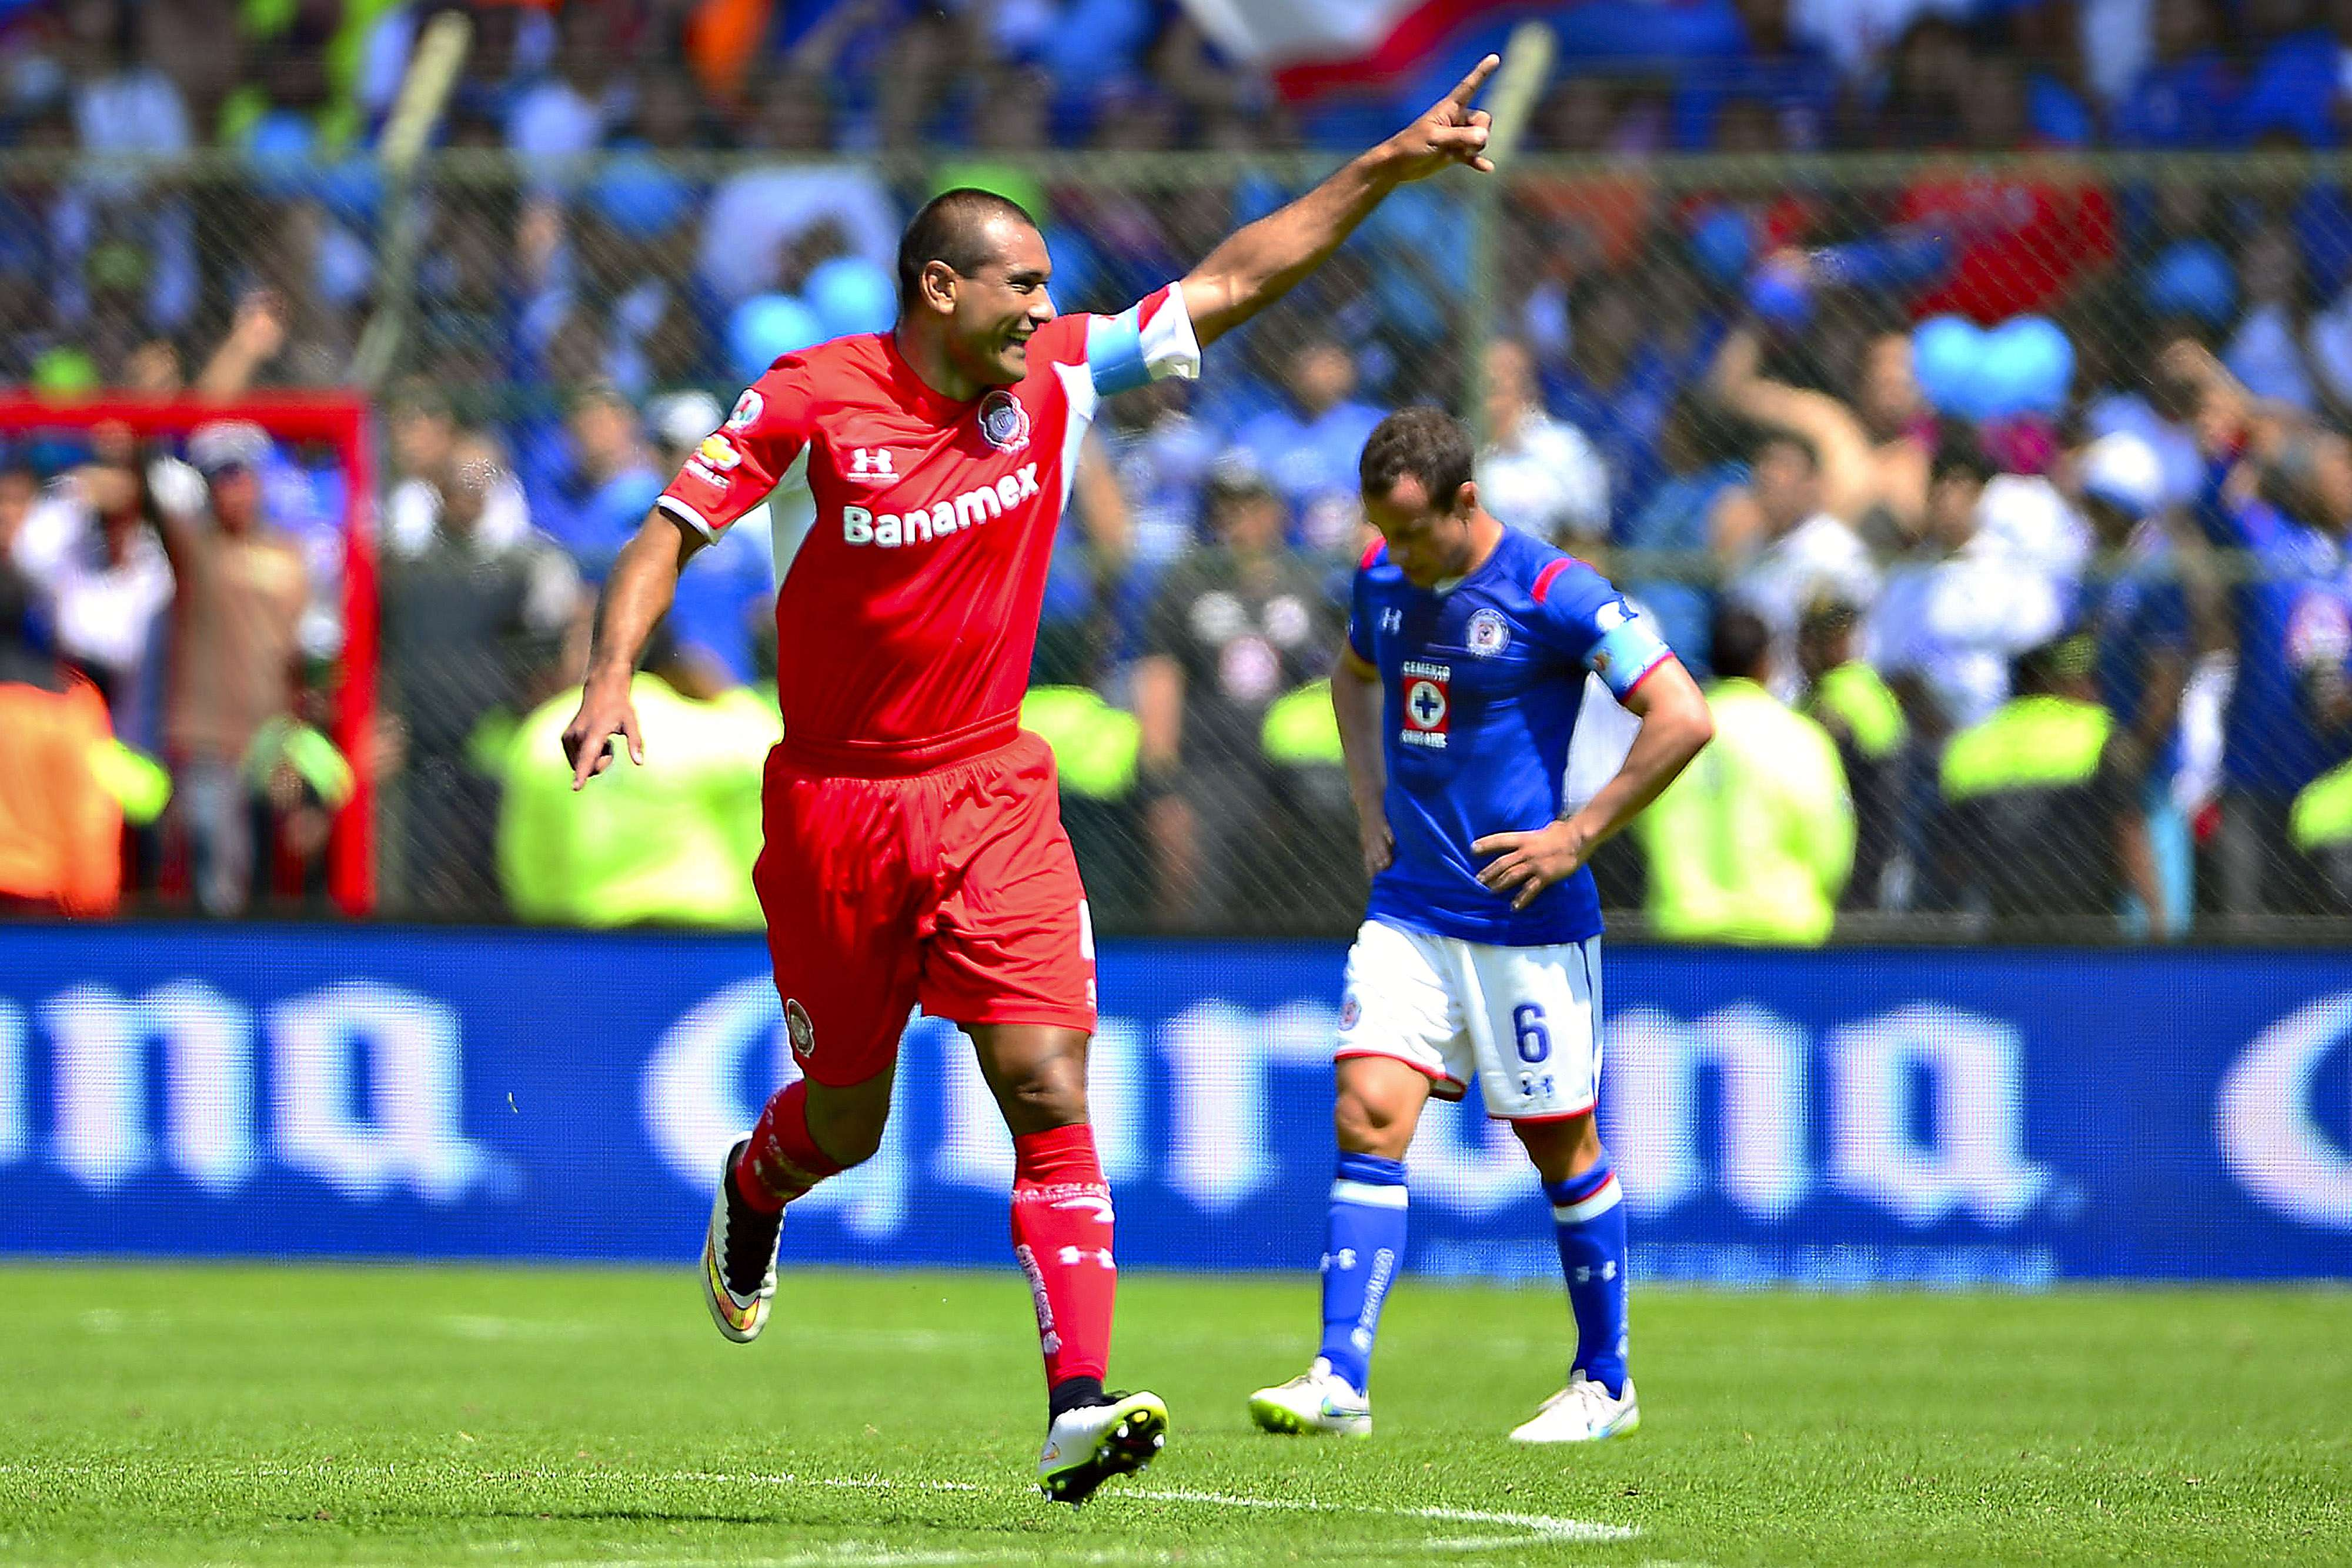 Paulo da Silva celebra el gol del triunfo de Toluca sobre Cruz Azul. Foto: Mexsport